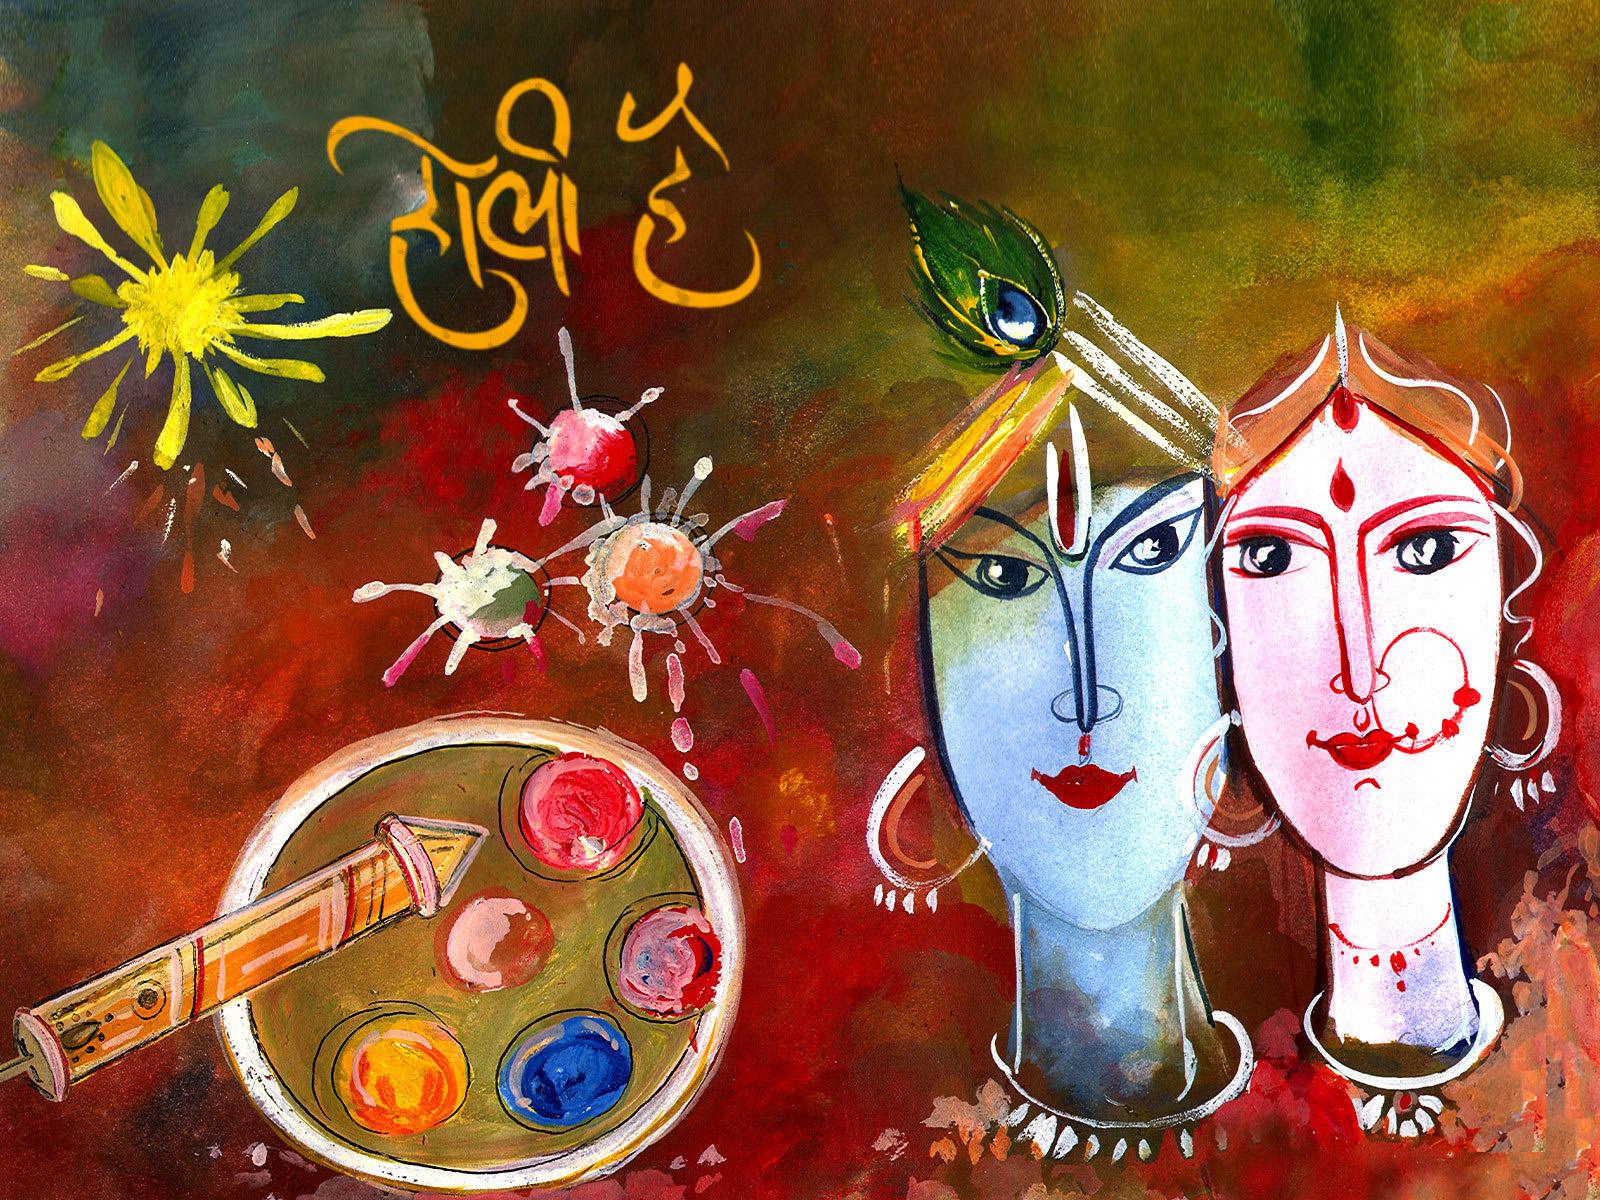 Colourful Holi Wallpaper - Radha Krishna Happy Holi - HD Wallpaper